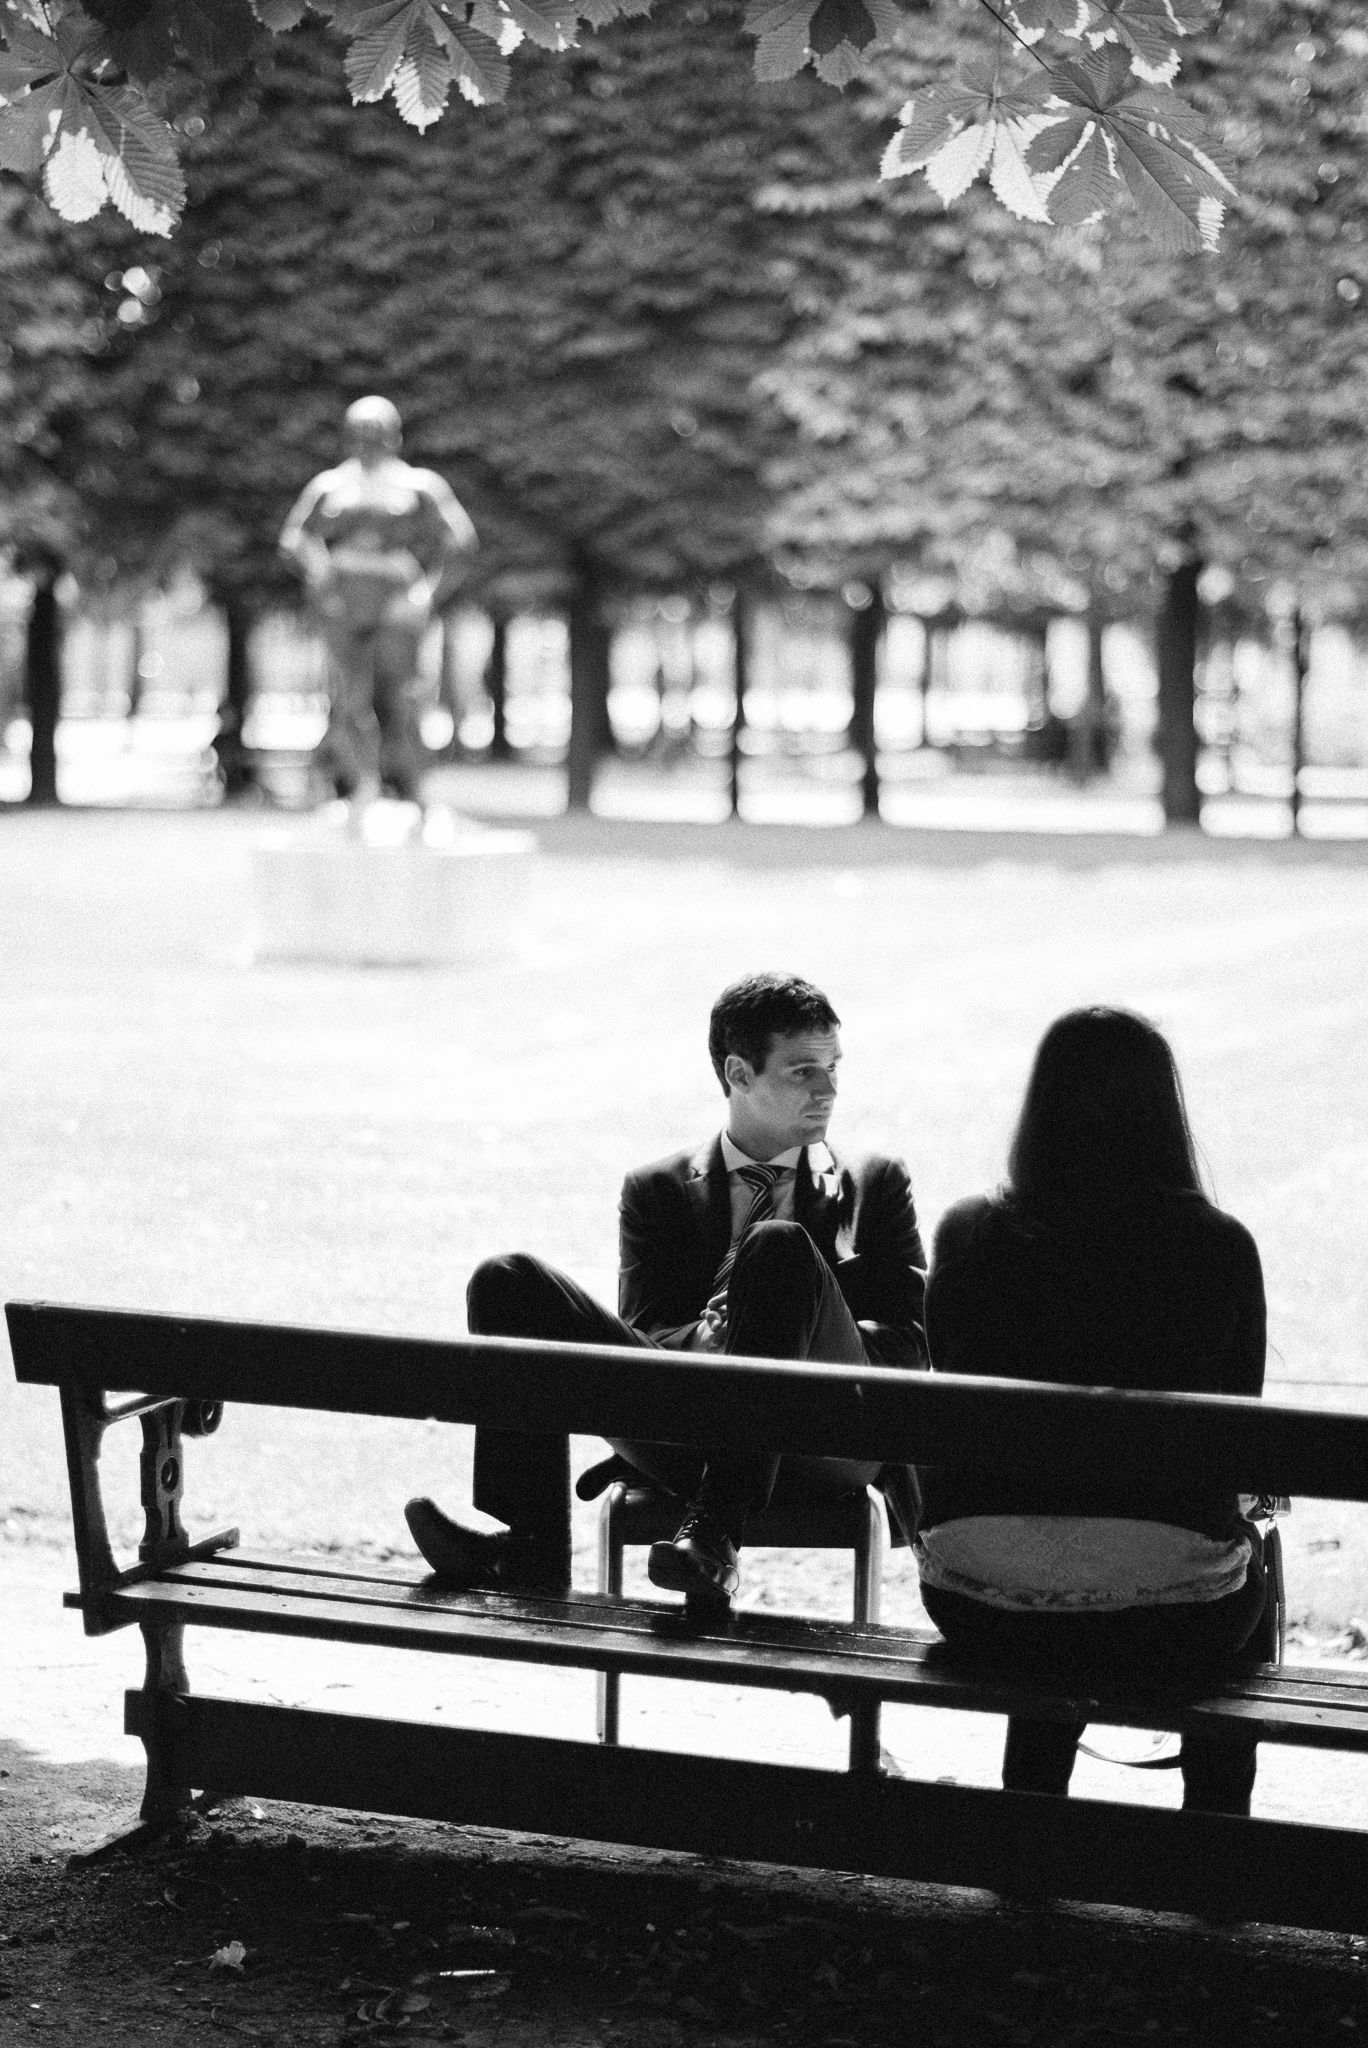 Lunch break, Jardin des Tuileries